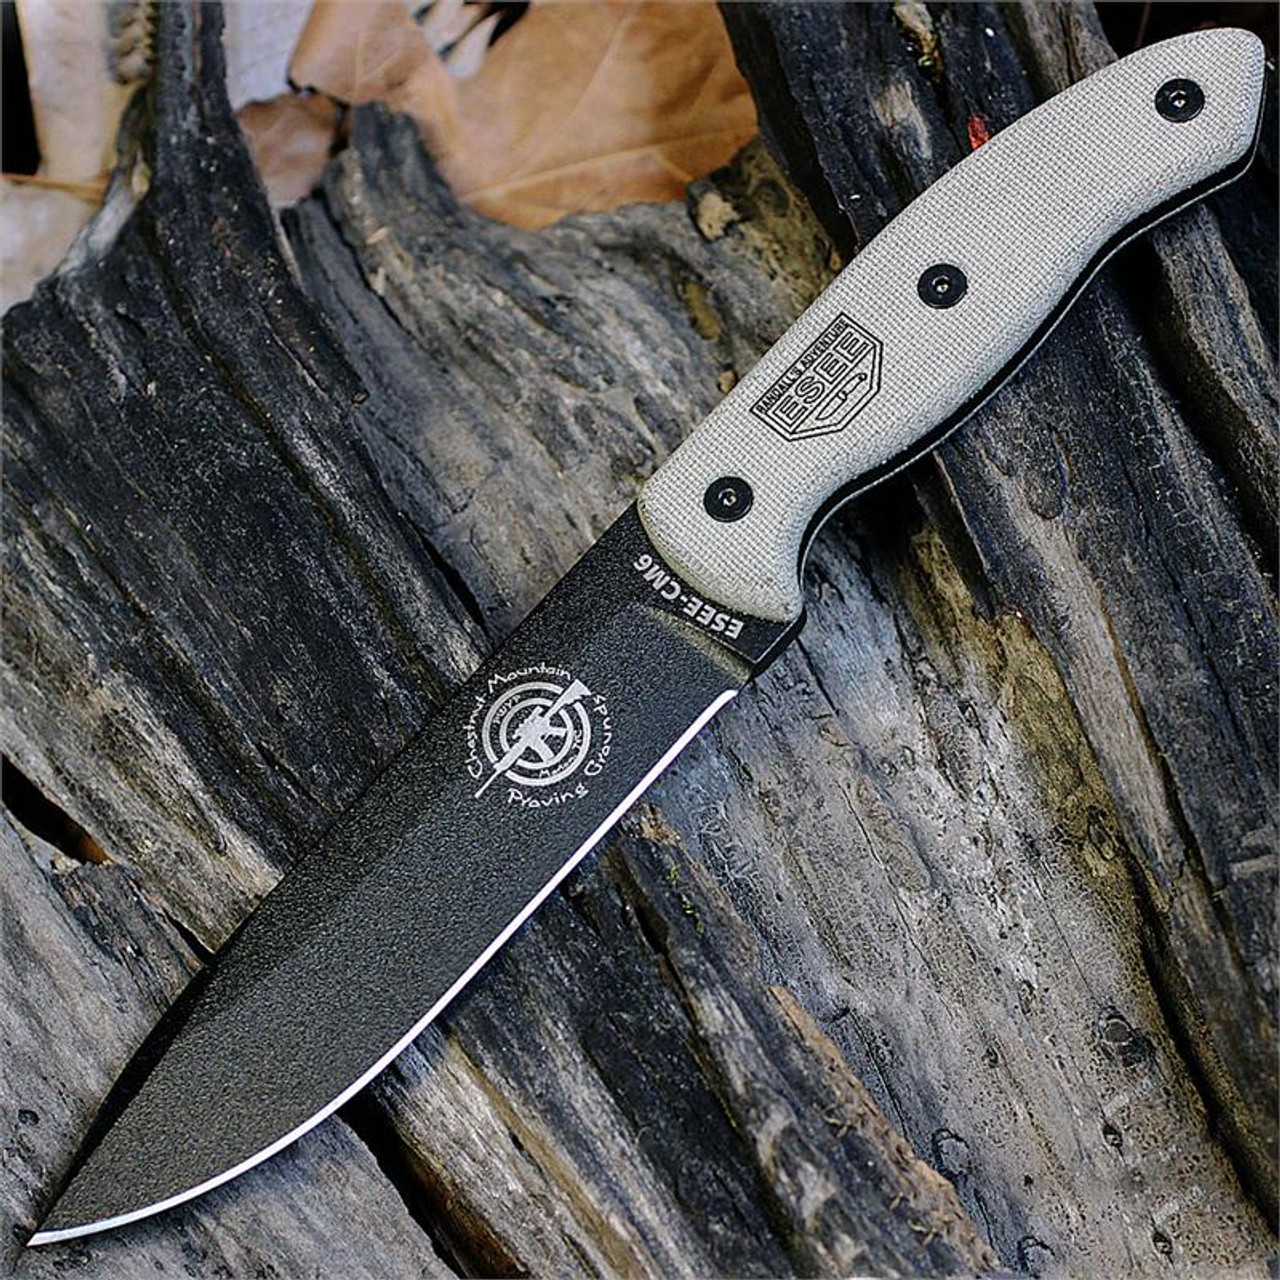 ESEE-CM6, Terrill Hoffman design